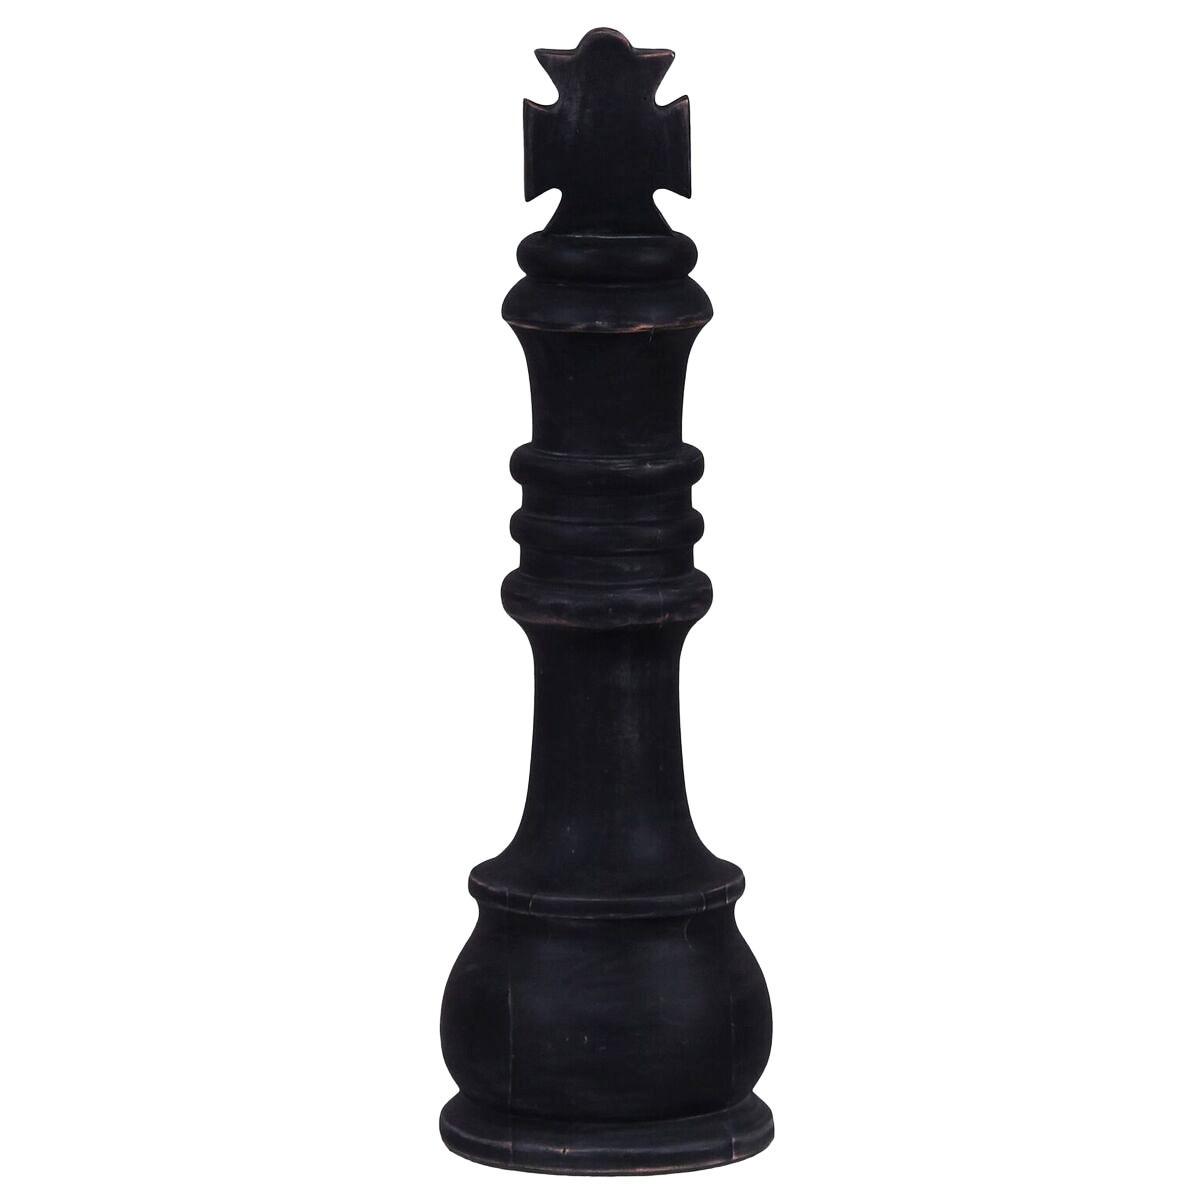 Alicia Mahogany Timber Chess Piece Ornament, King, Distressed Black